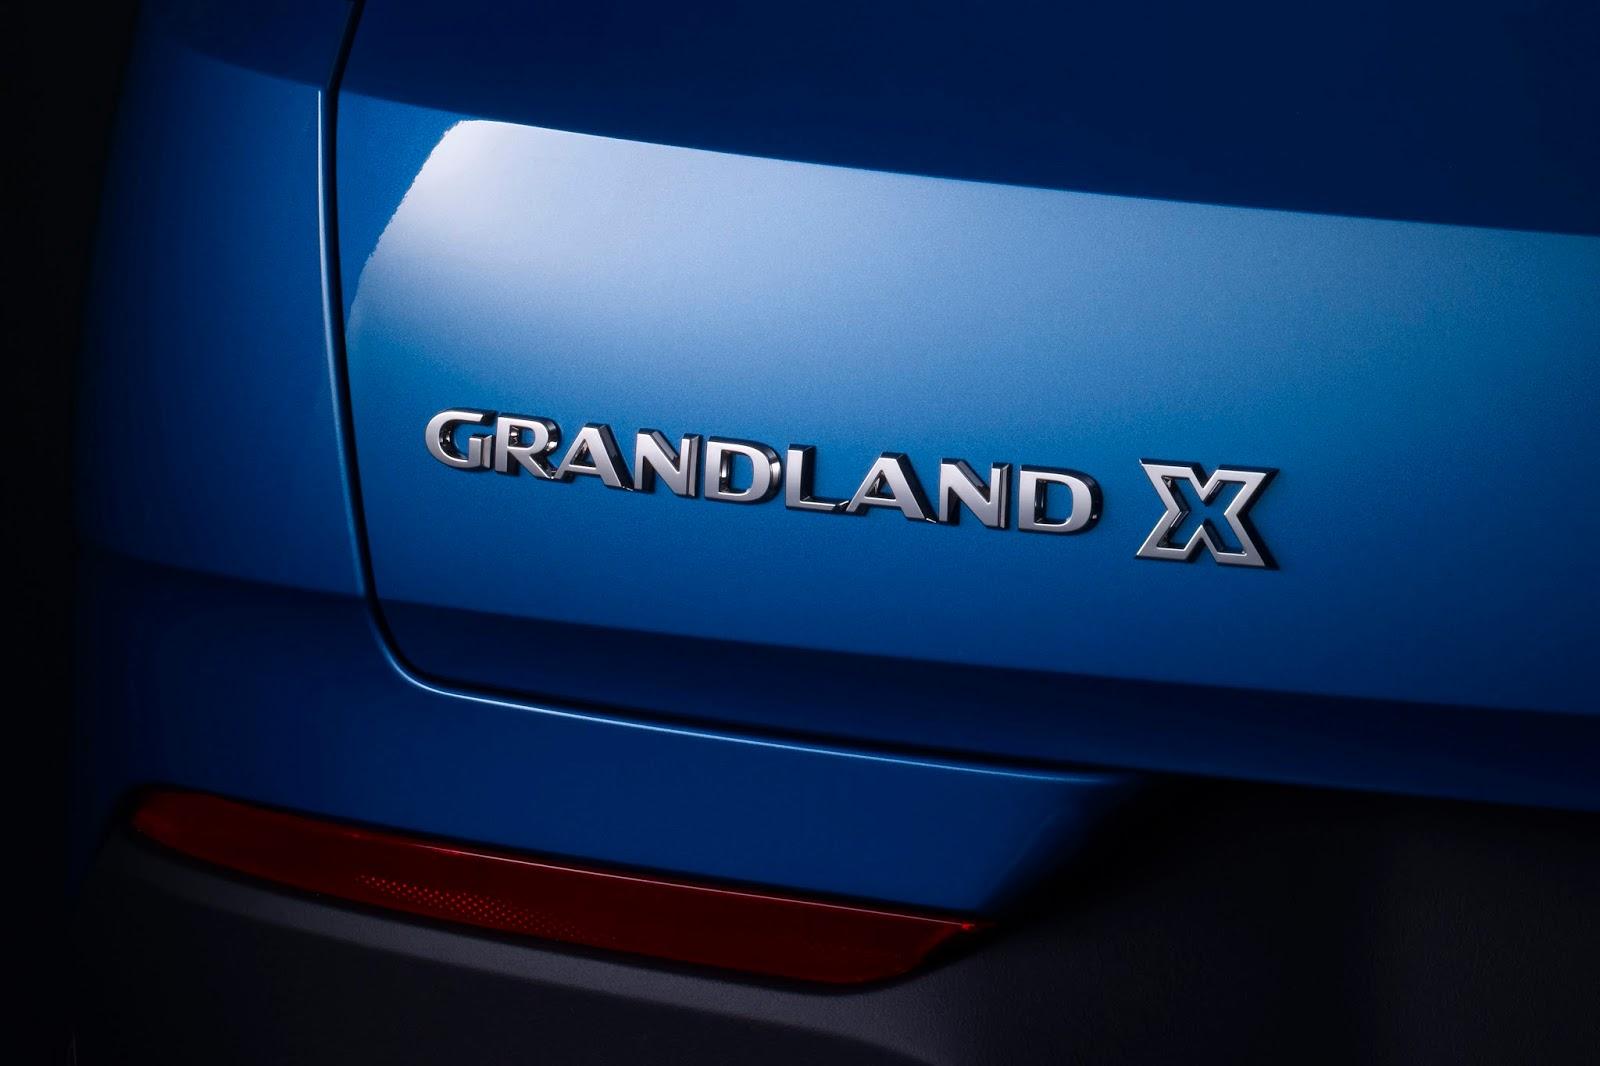 Opel Grandland X 305592 Το μεγάλο SUV της Opel, το Grandland X, έρχεται το φθινόπωρο Opel, Opel Grandland, Opel Grandland X, SUV, videos, Λανσάρισμα